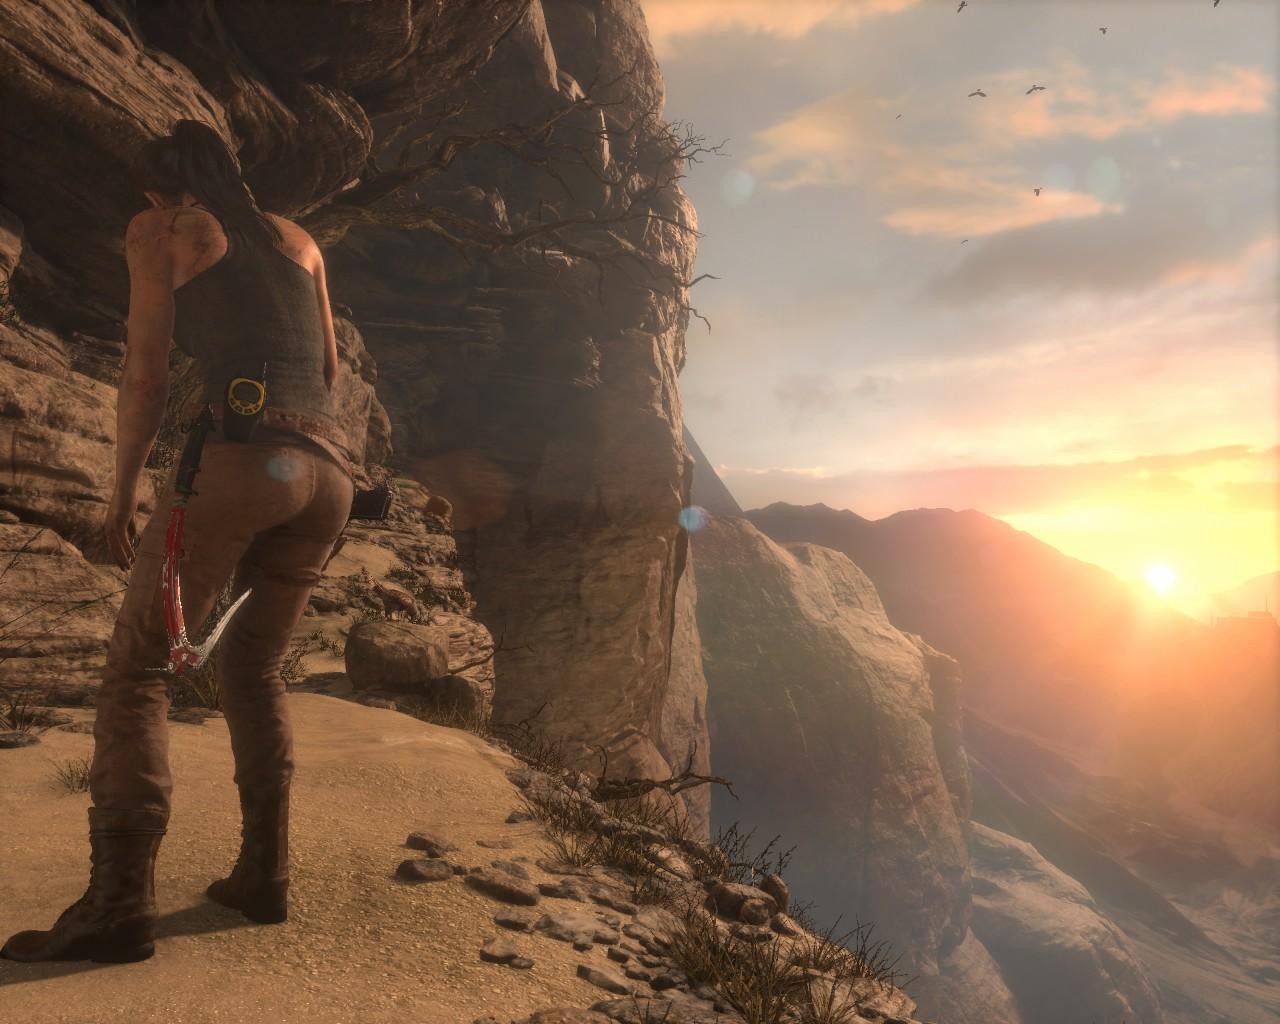 20170308115105_1.jpg - Rise of the Tomb Raider